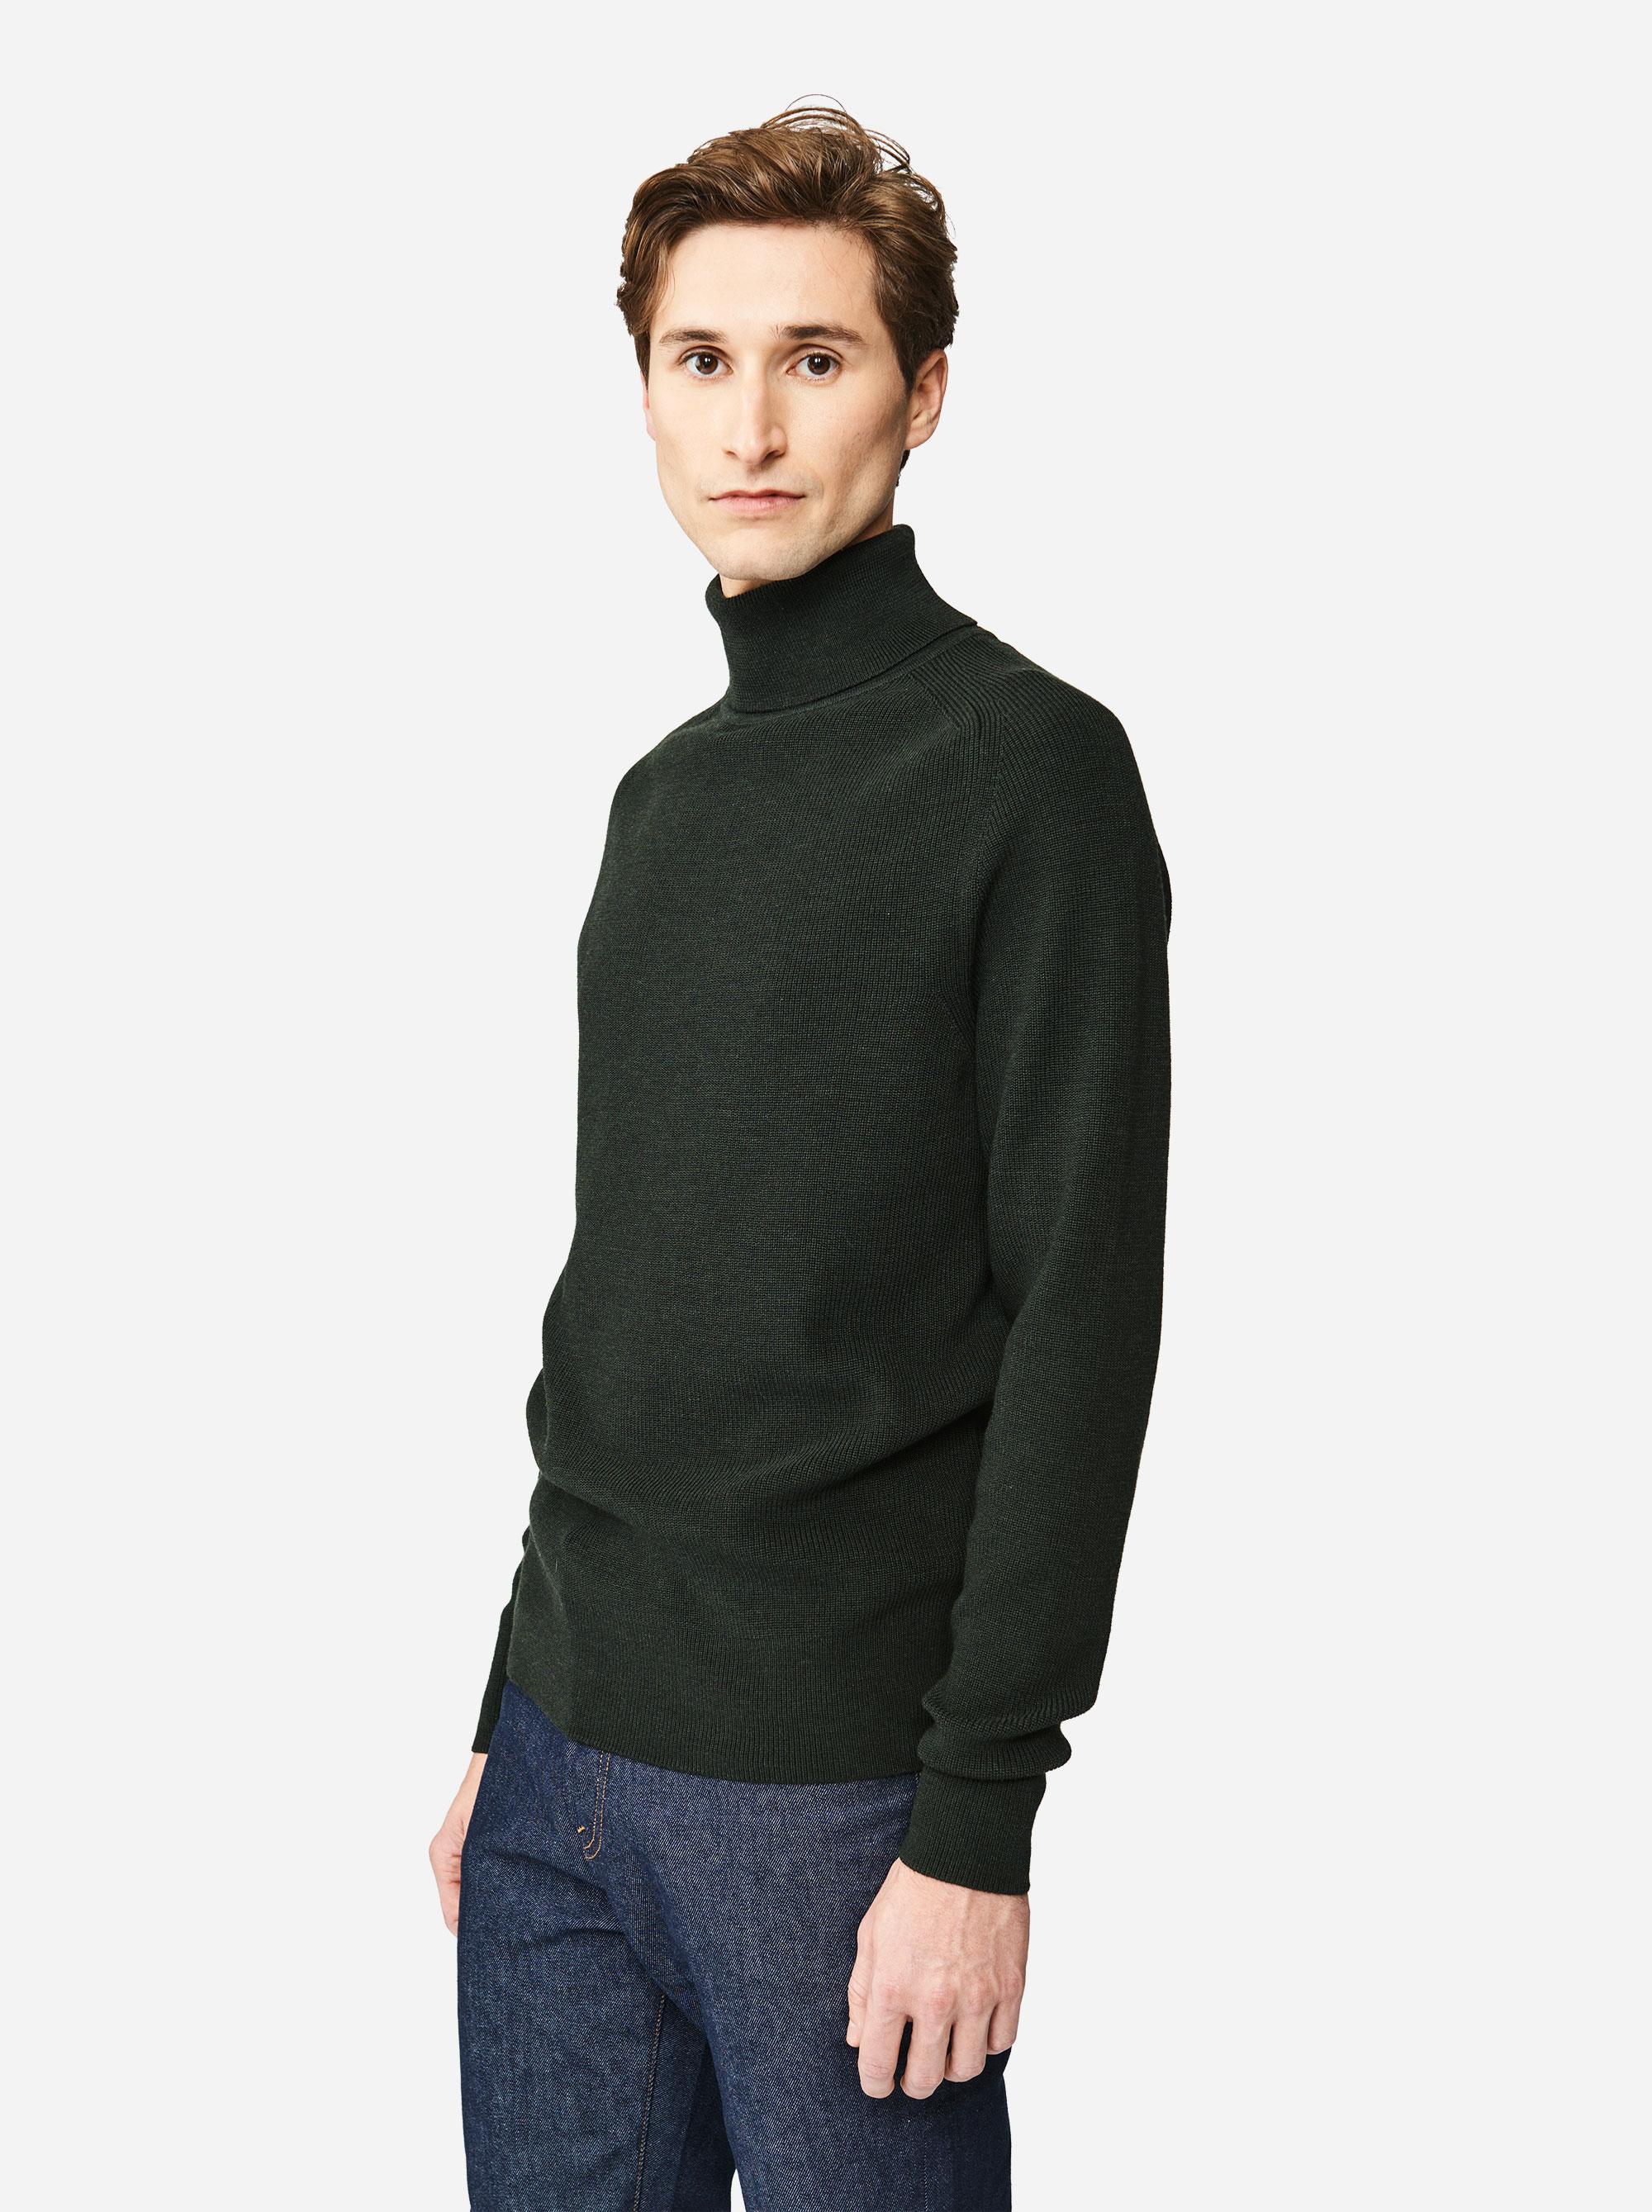 Teym - Turtleneck - The Merino Sweater - Men - Green - 2